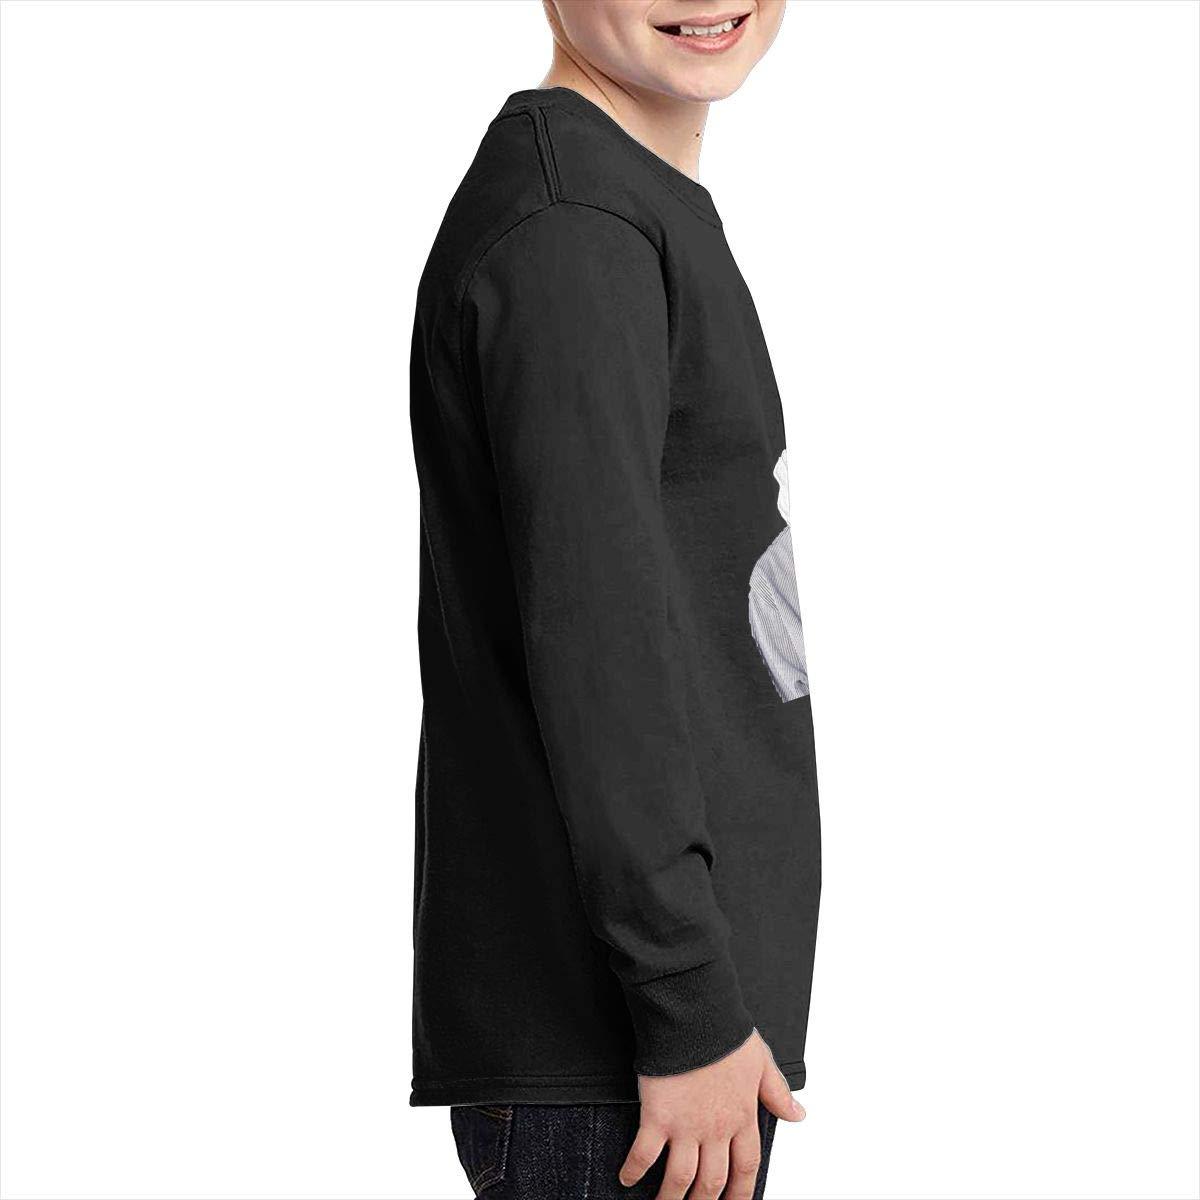 TWOSKILL Youth Blue-face Long Sleeves Shirt Boys Girls